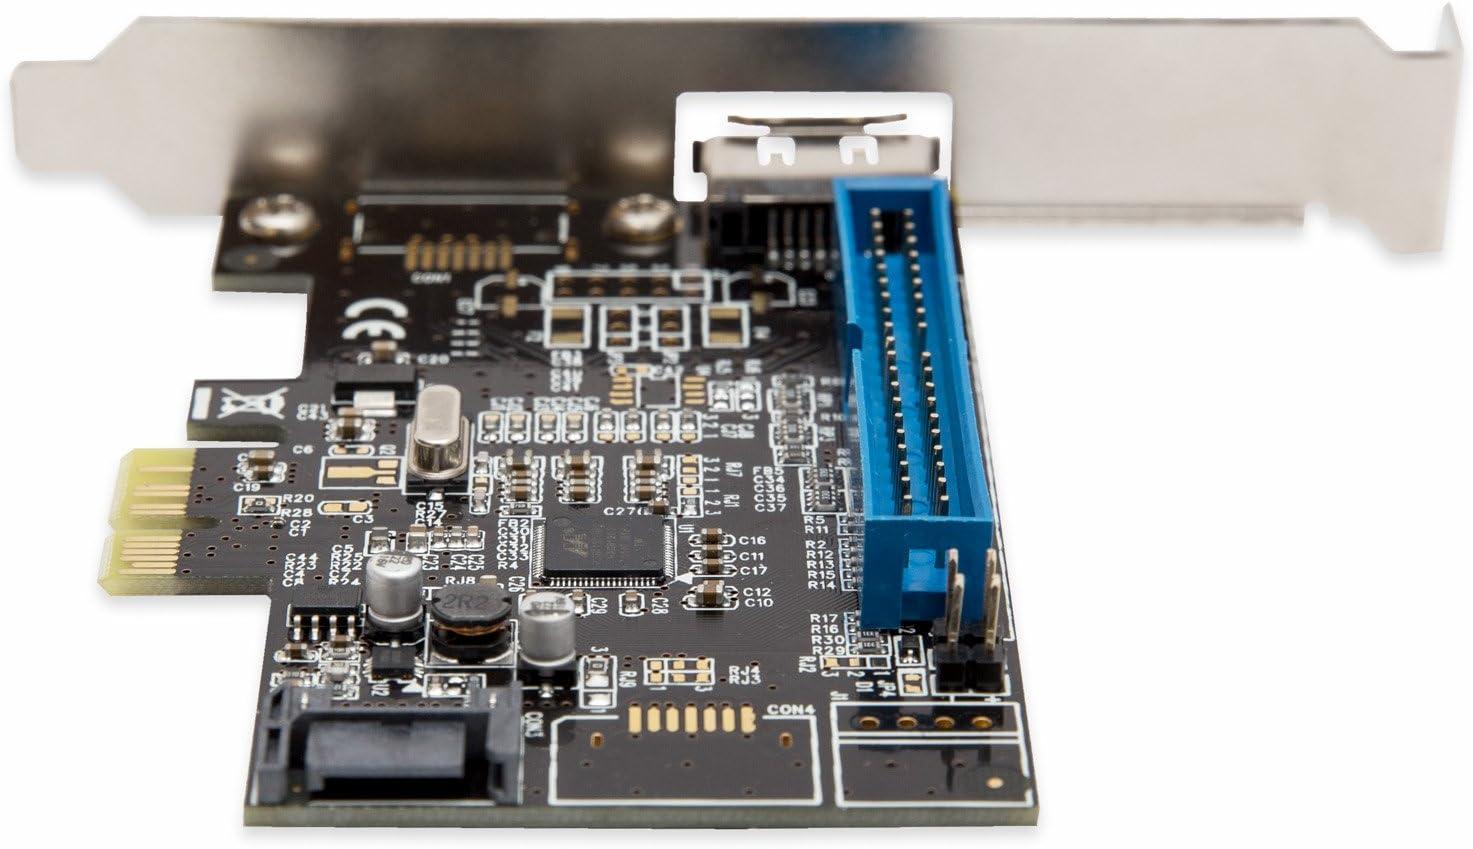 Syba Combo SATA III PCI-Express RAID 0 1 Card SD-PEX40035 + IDE Ports 2+1 6.0Gbps